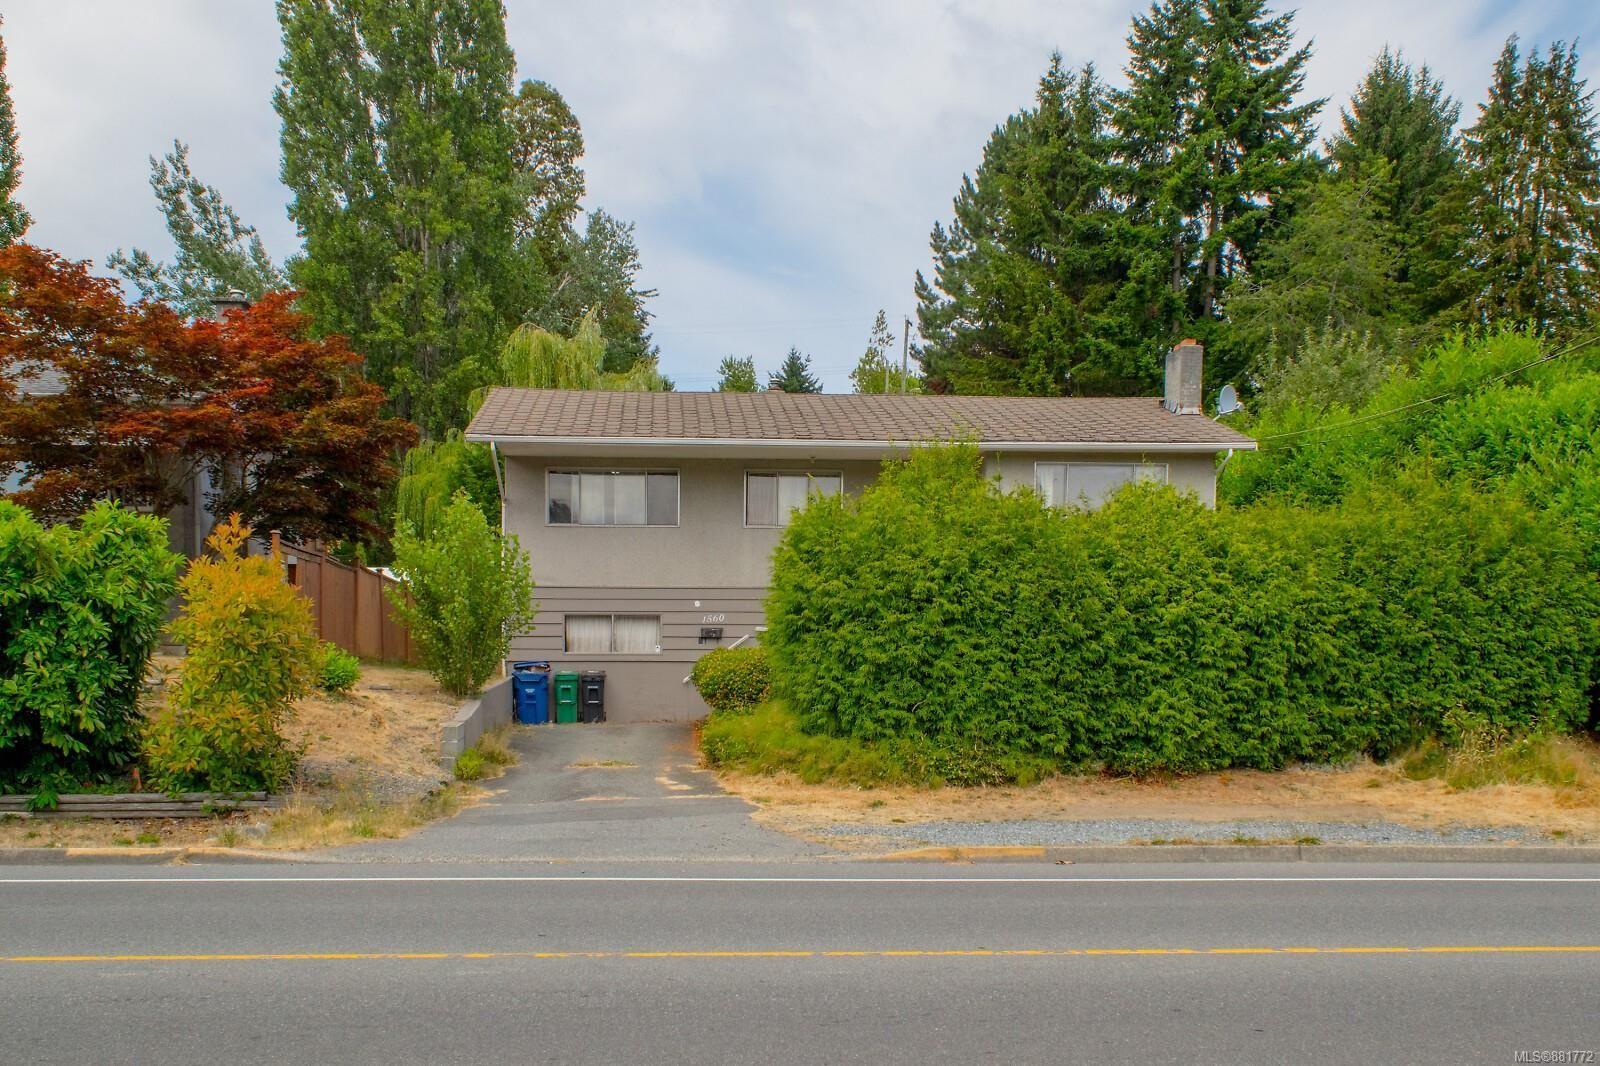 Main Photo: 1560 Bush St in : Na Central Nanaimo House for sale (Nanaimo)  : MLS®# 881772